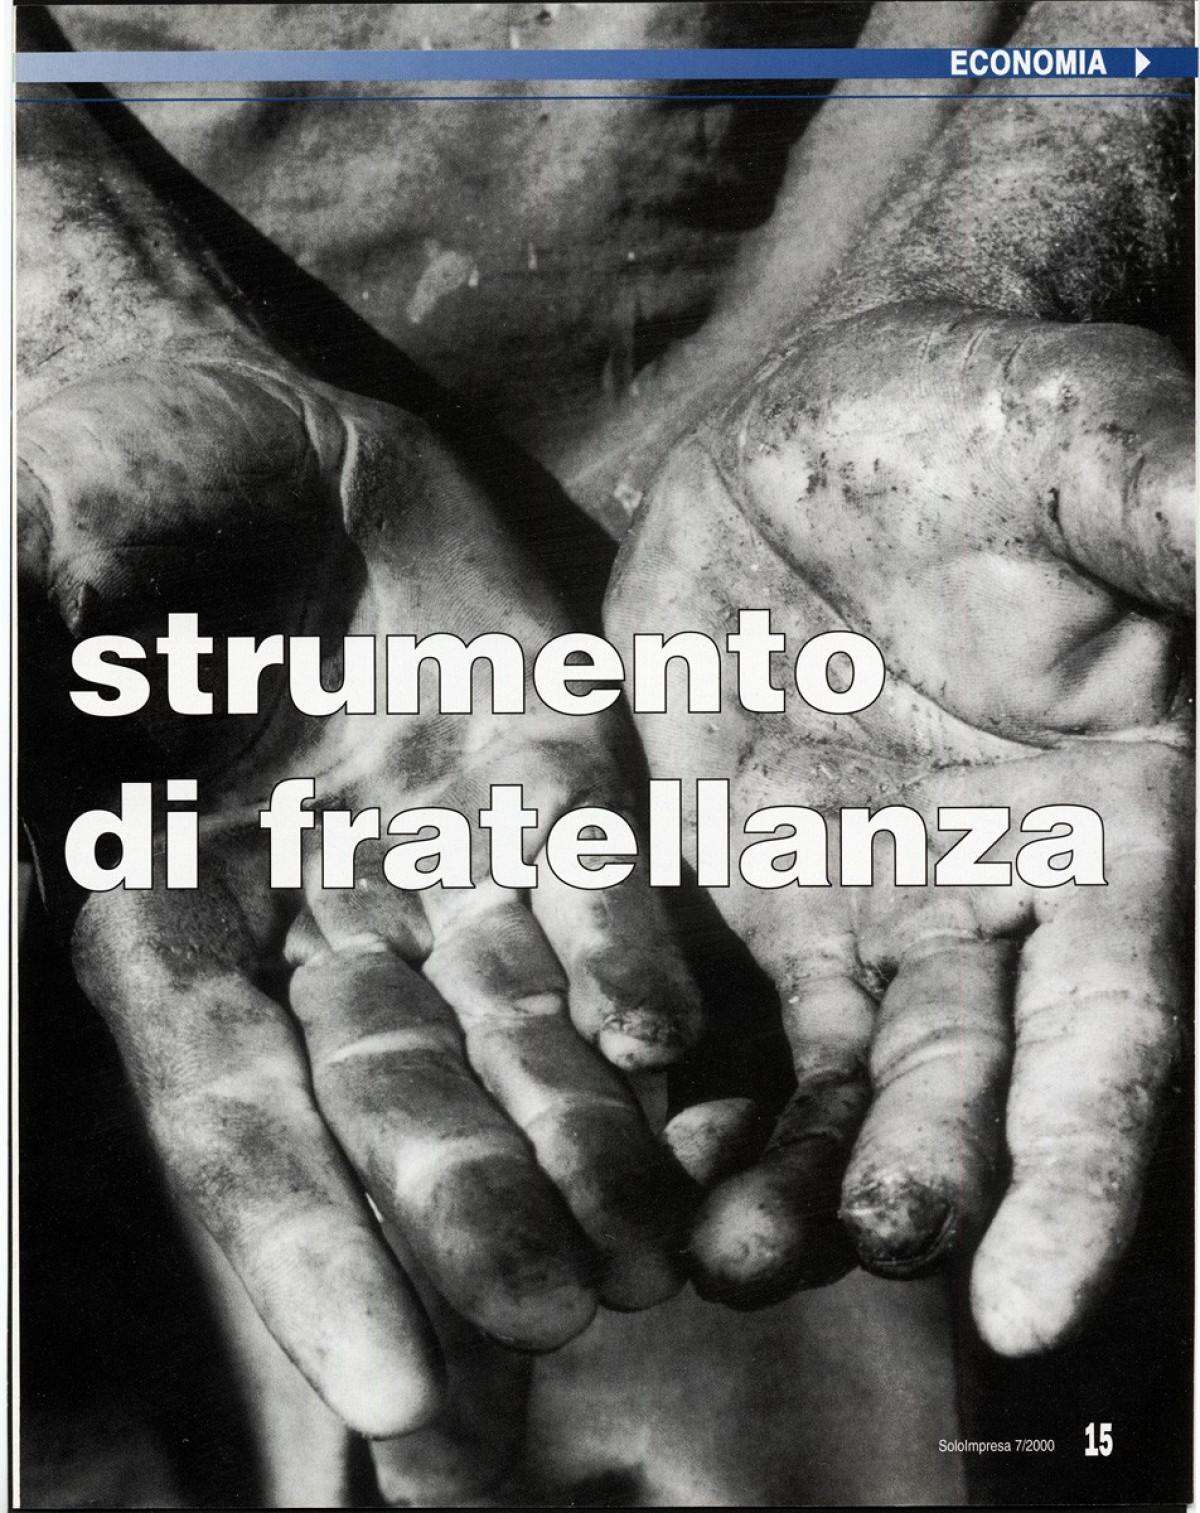 2000 - Immigrants workers - Solo impresa